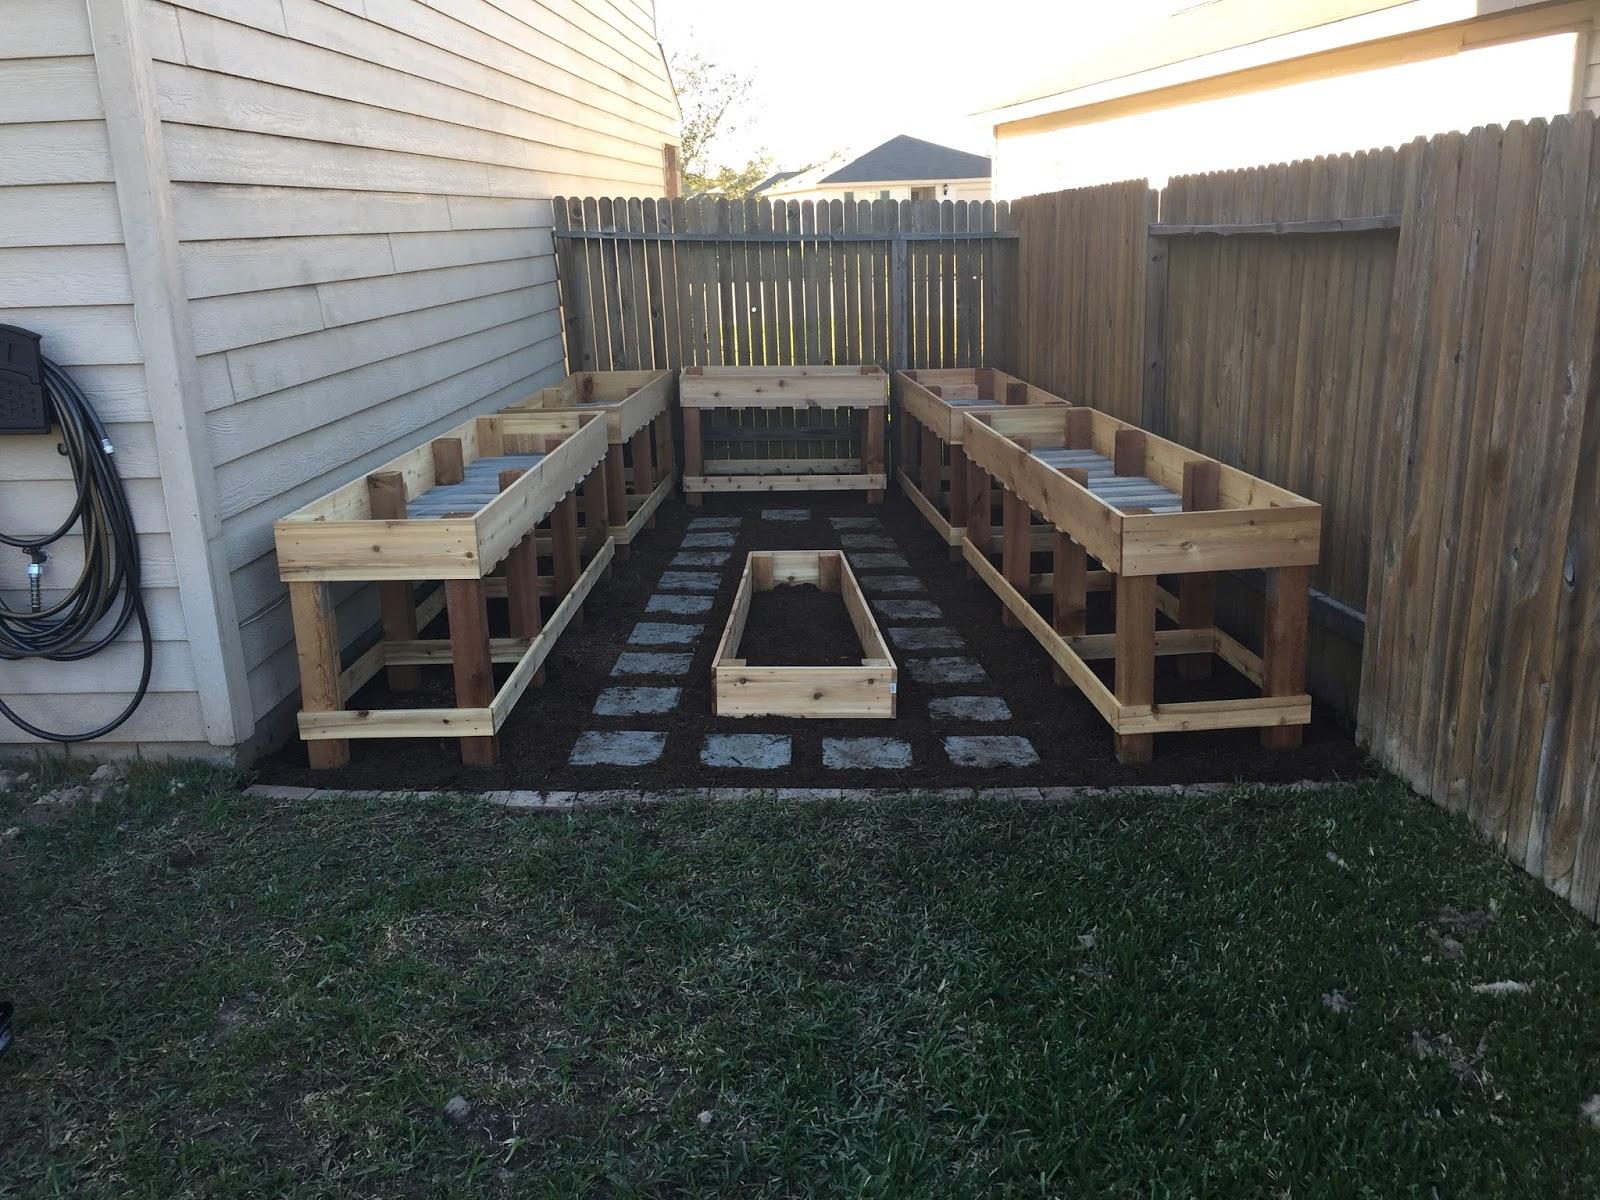 The Wellness PA-C: DIY Raised Garden Beds on Backyard Raised Garden Bed Ideas id=64122